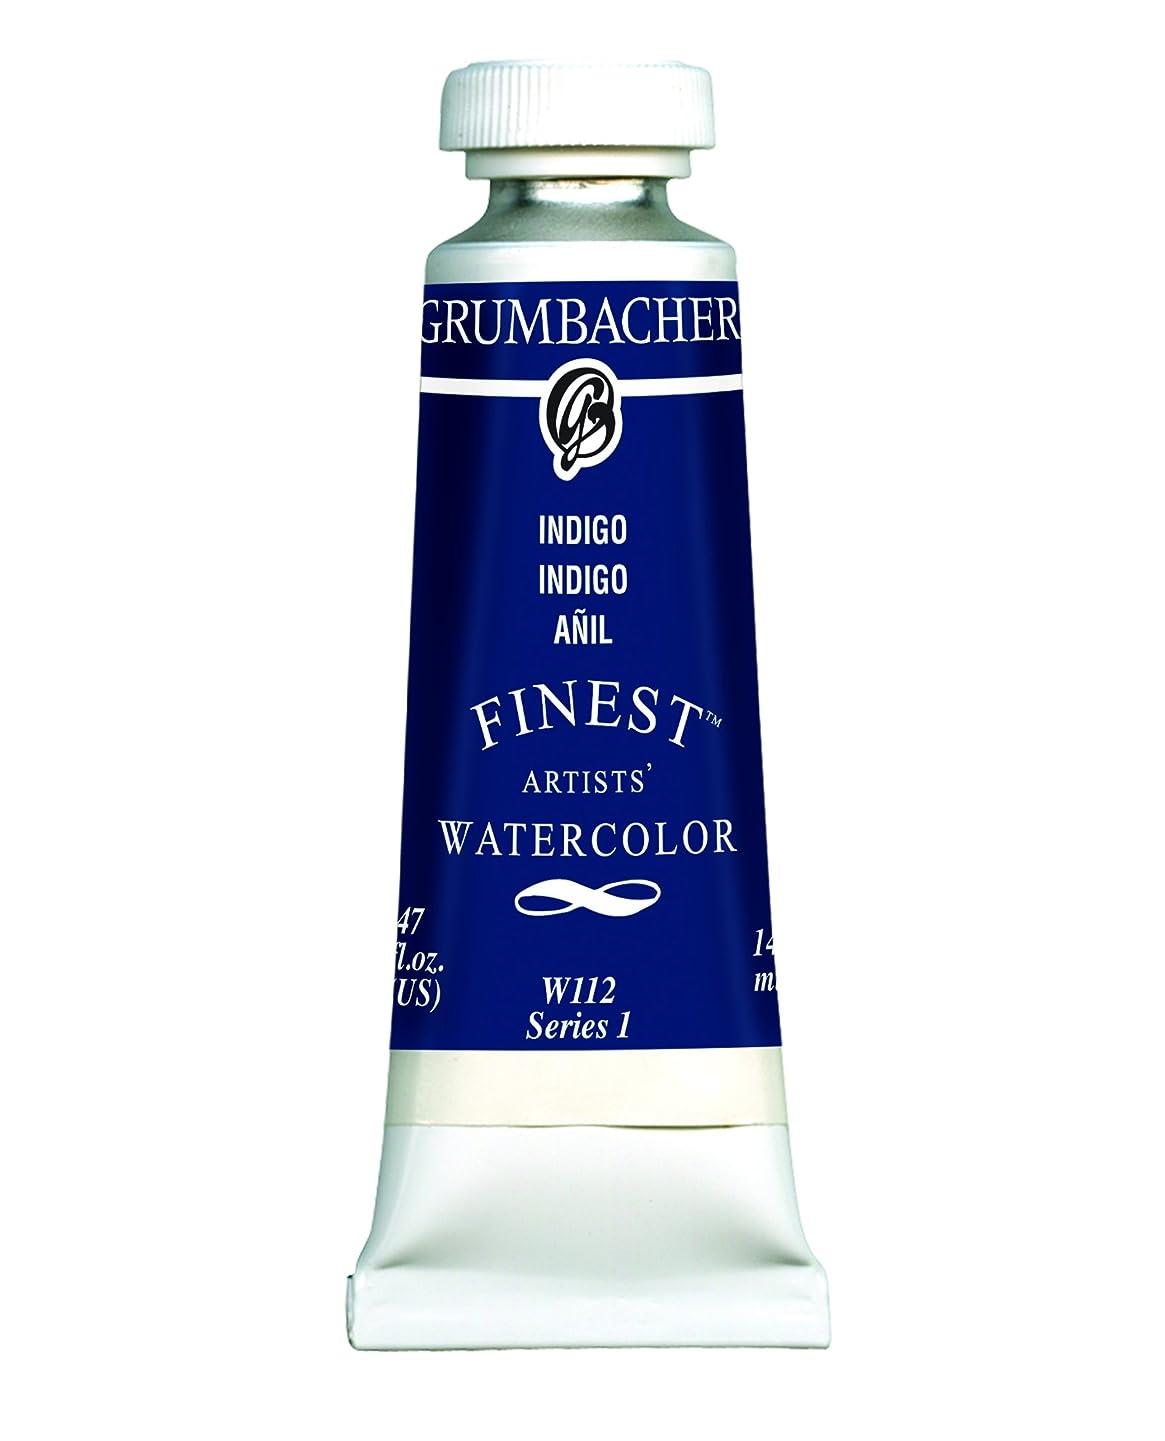 Grumbacher Finest Watercolor Paint, 14 ml/0.47 oz, Indigo